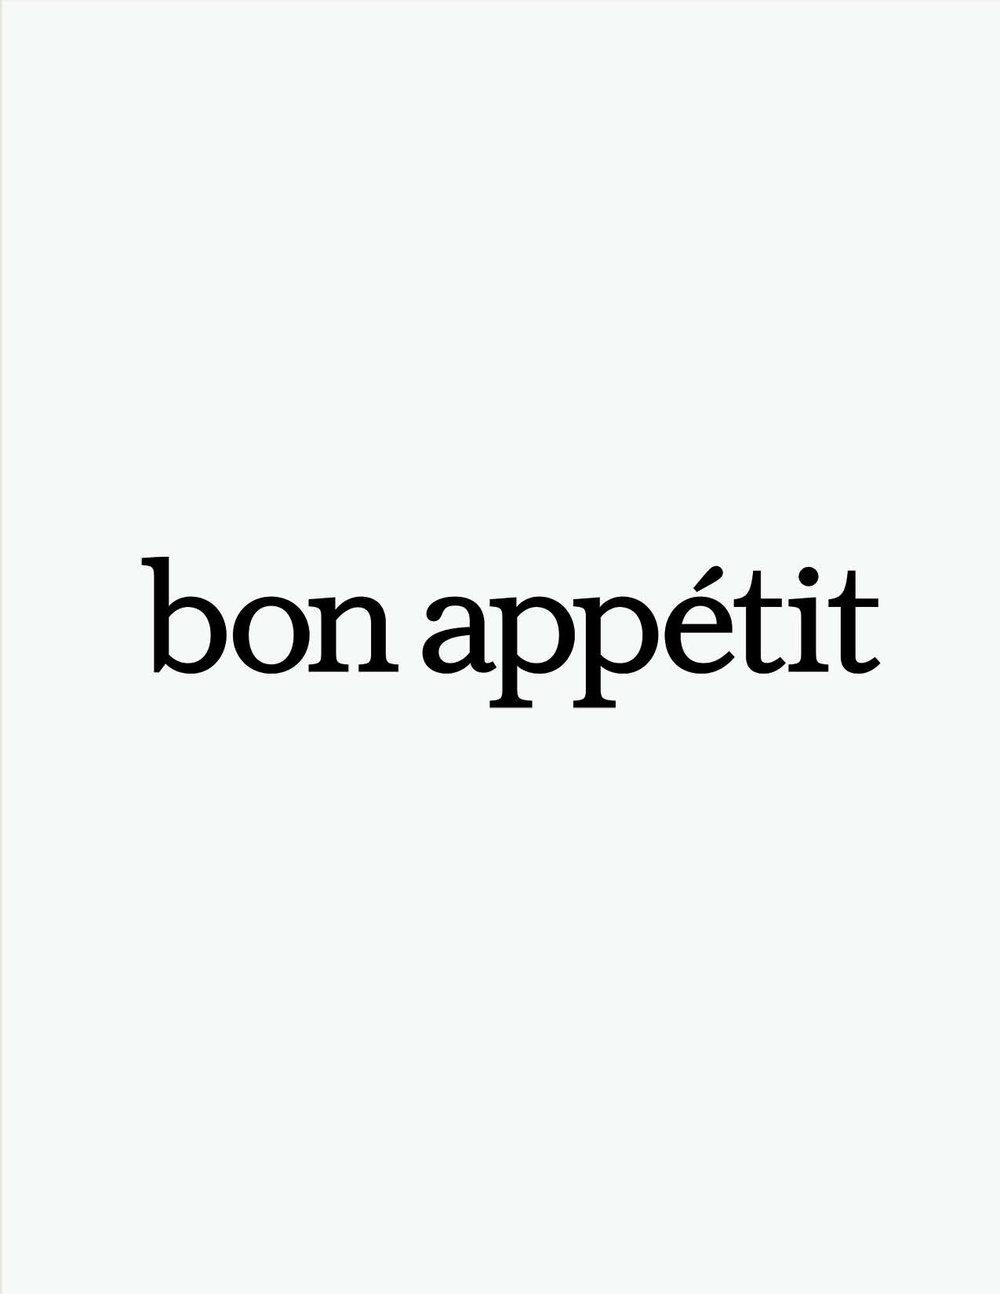 BODEGA_BONAPP.jpg